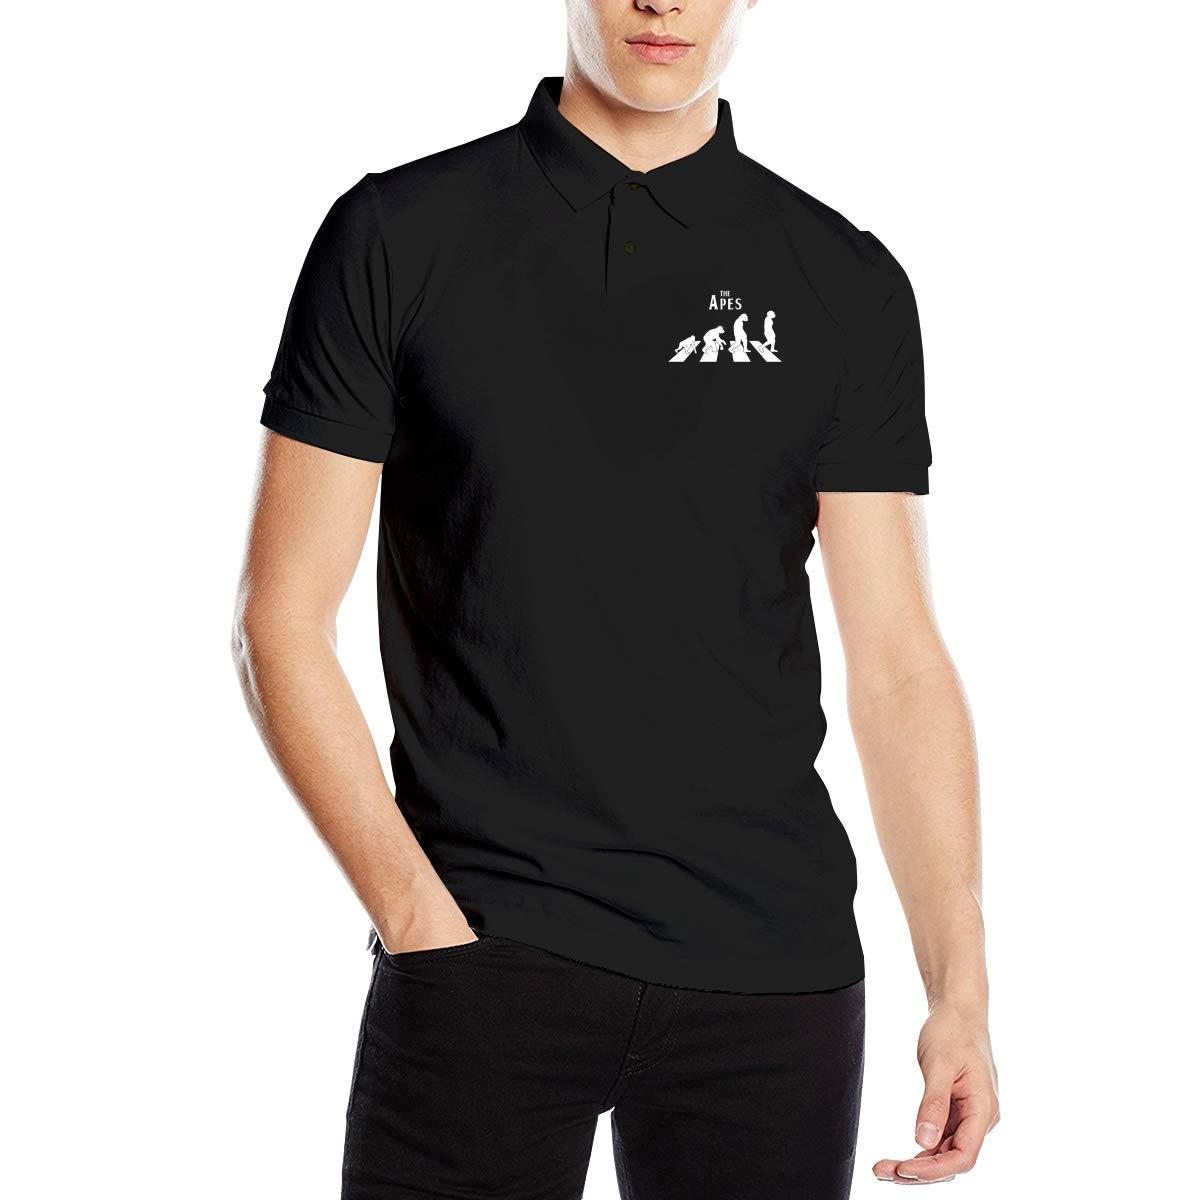 YONG-SHOP The Apes W Mens Premium Polo Shirt Unofficial